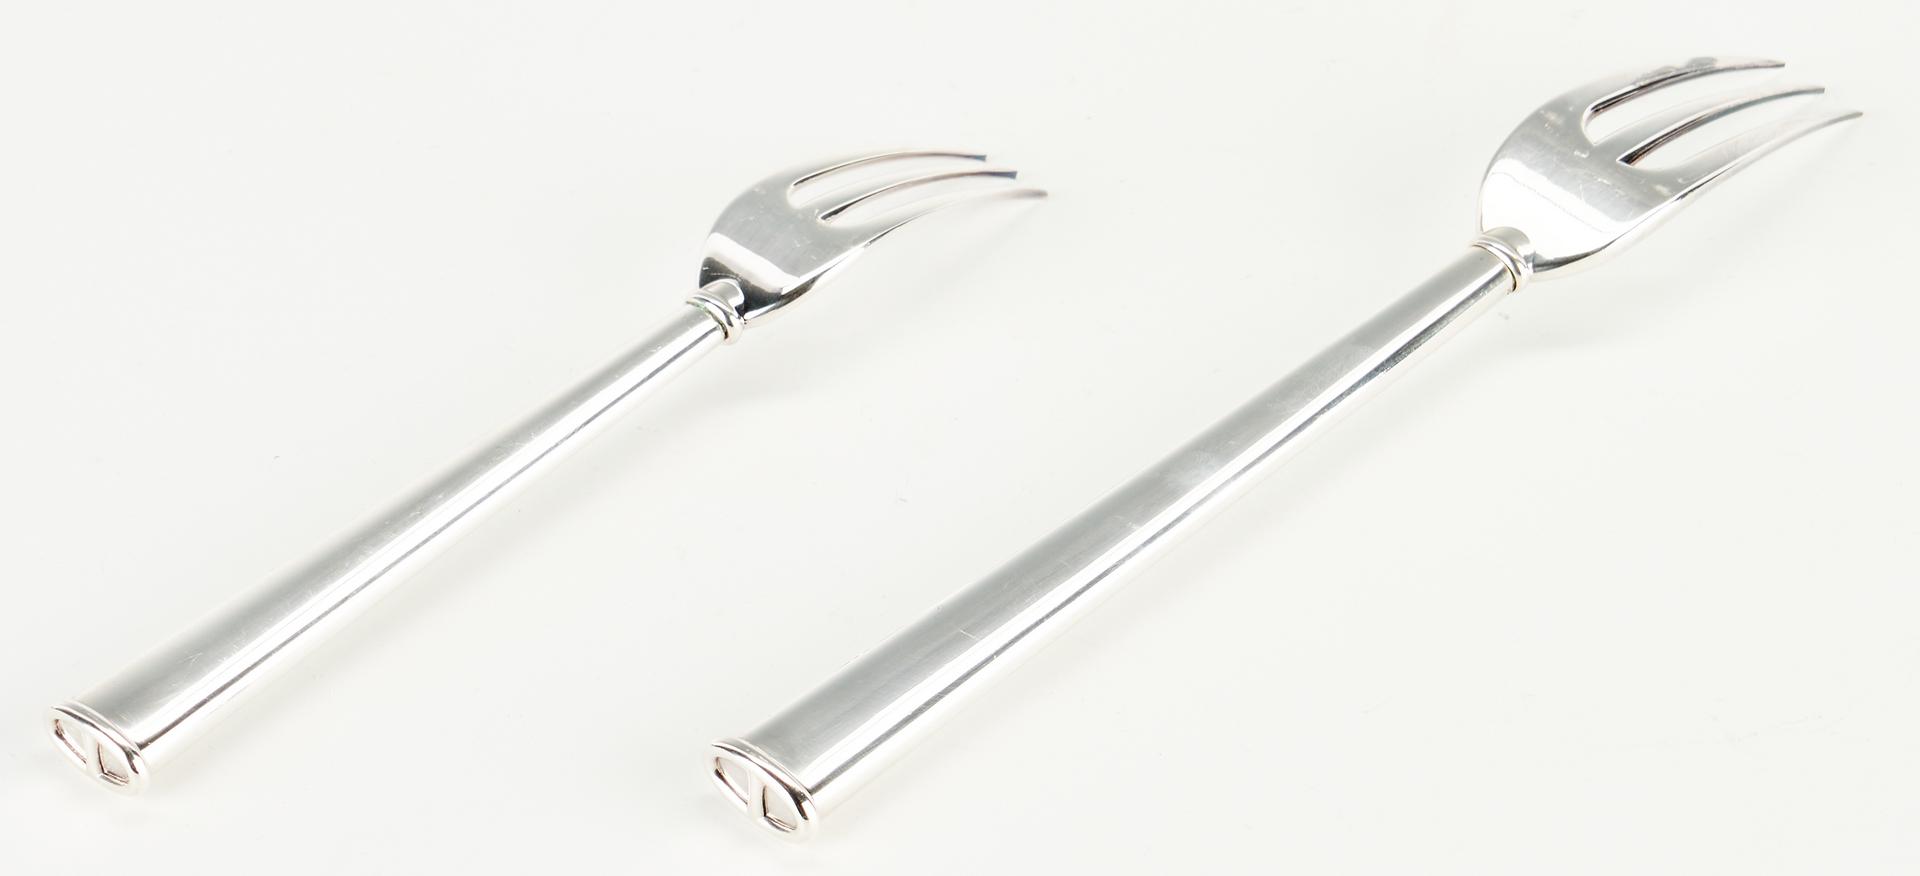 Lot 552: 42 pcs. Hermes Comete Silverplated Flatware w/ Boxes